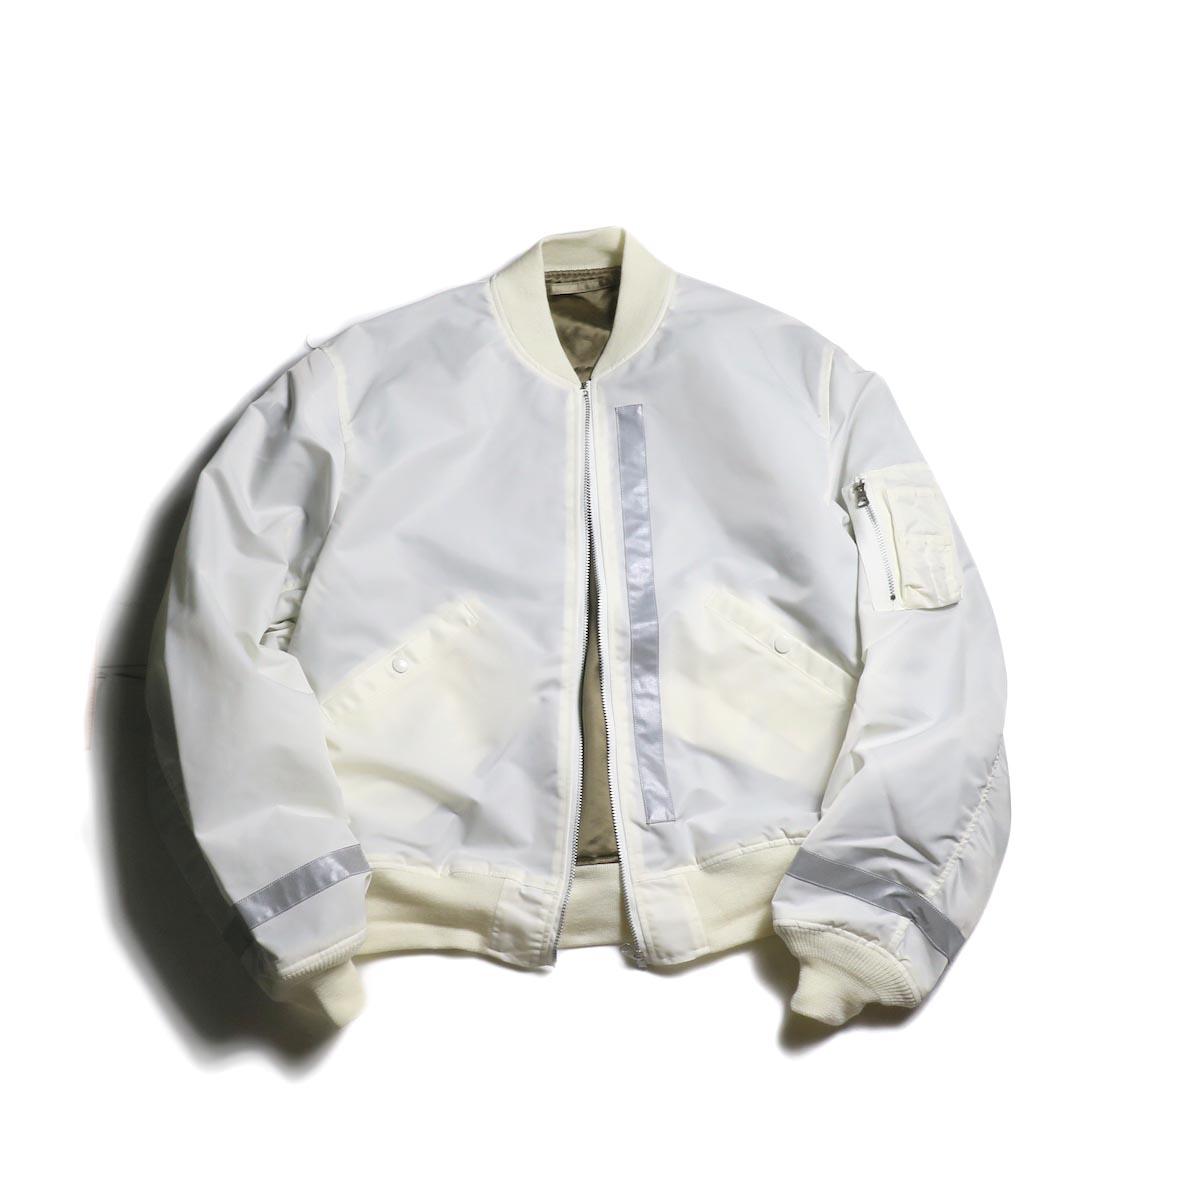 UNUSED × BUZZ RICKSON'S / US1640 Reversible Flight Jacket (White)